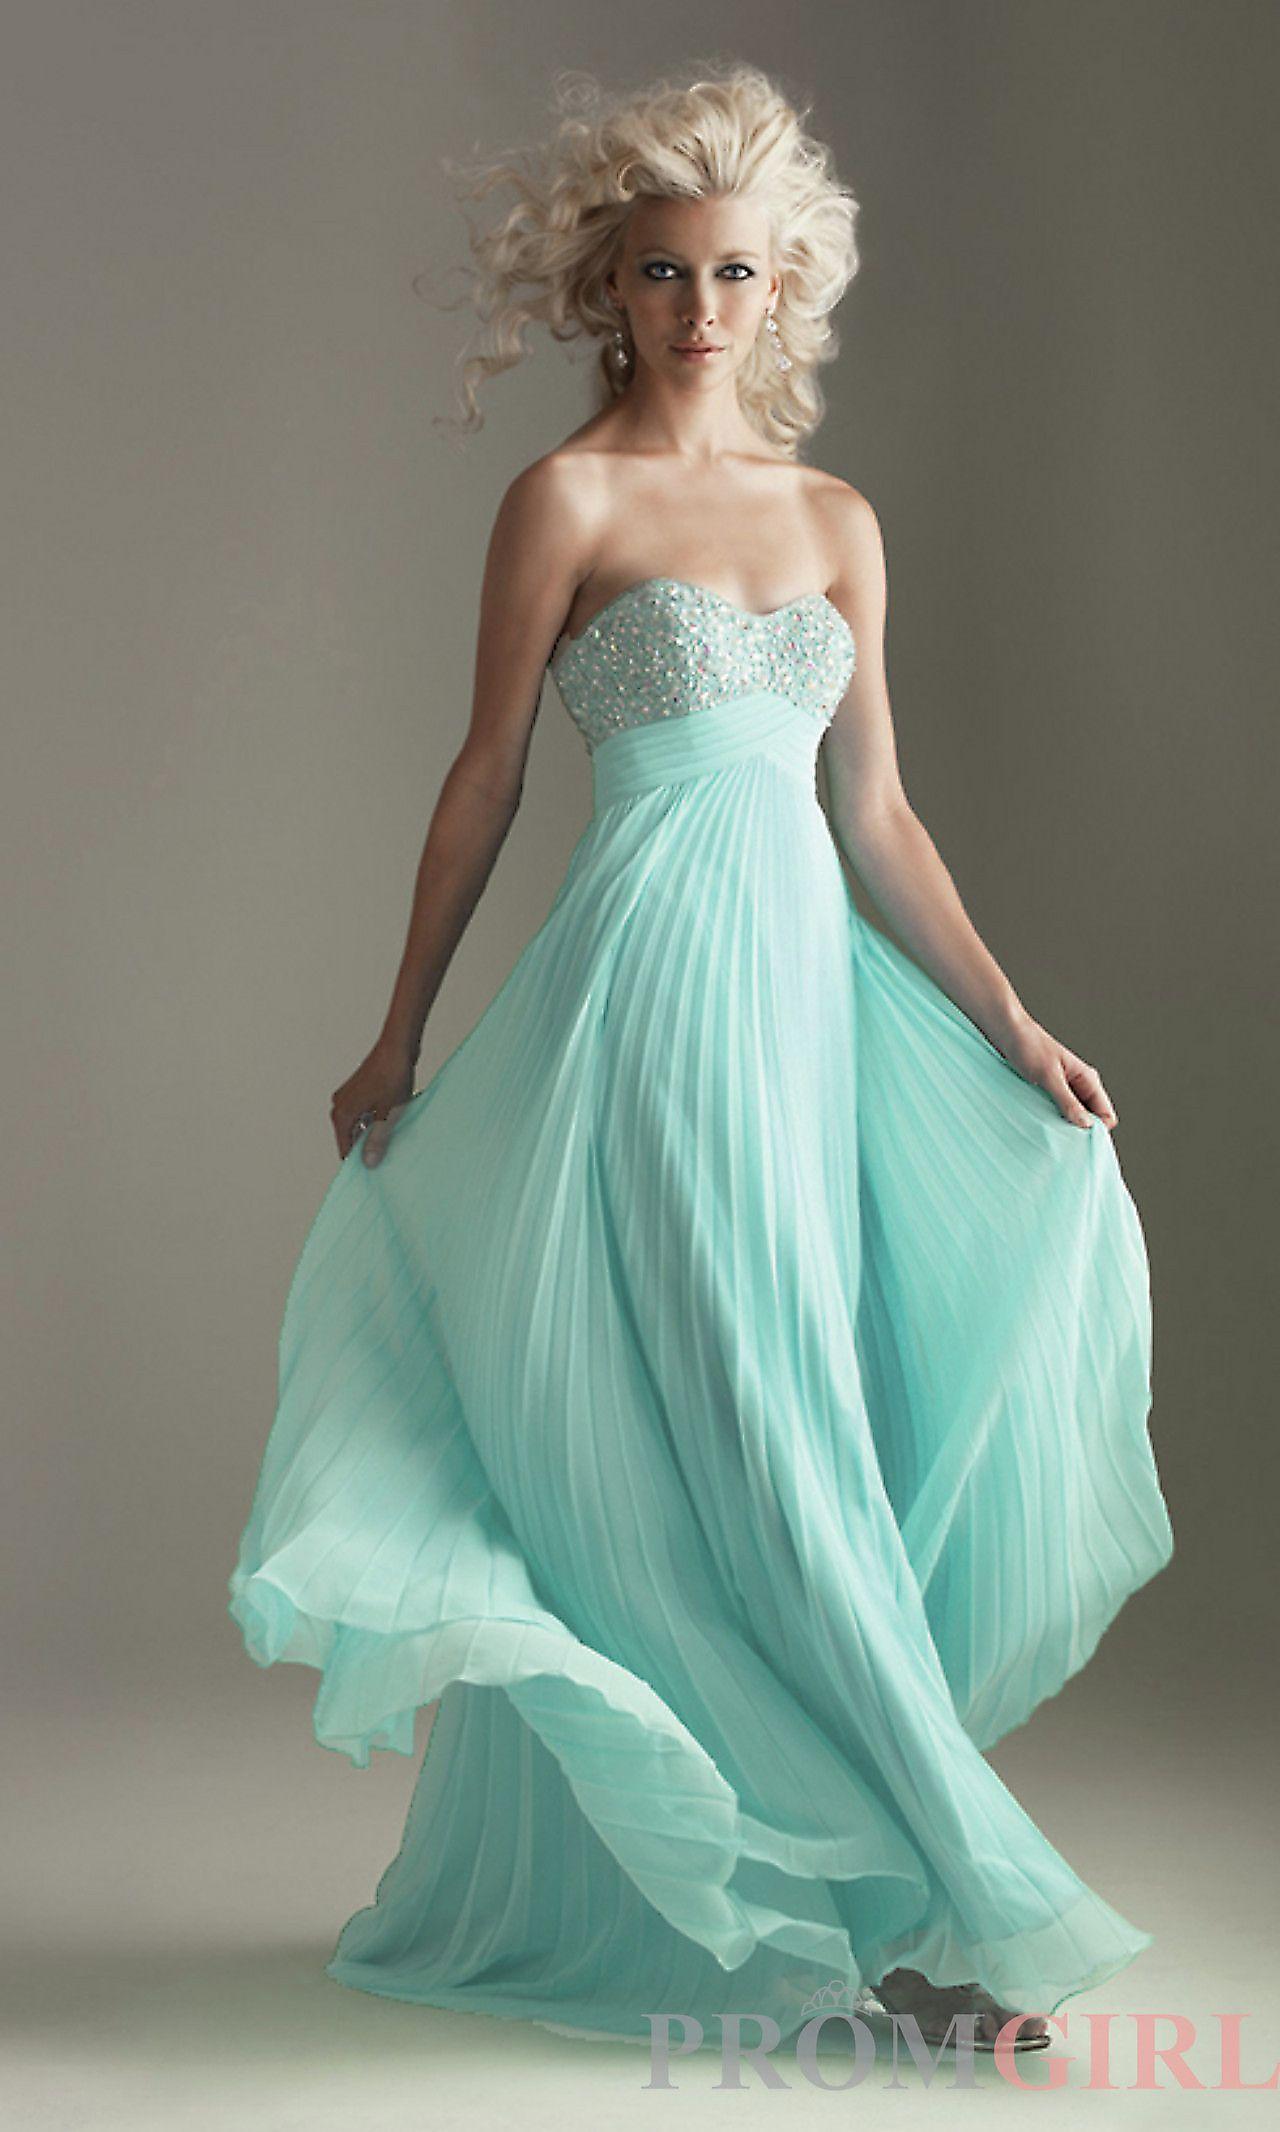 Strapless Pleated Prom Dress NM-6237   Fashion.!\